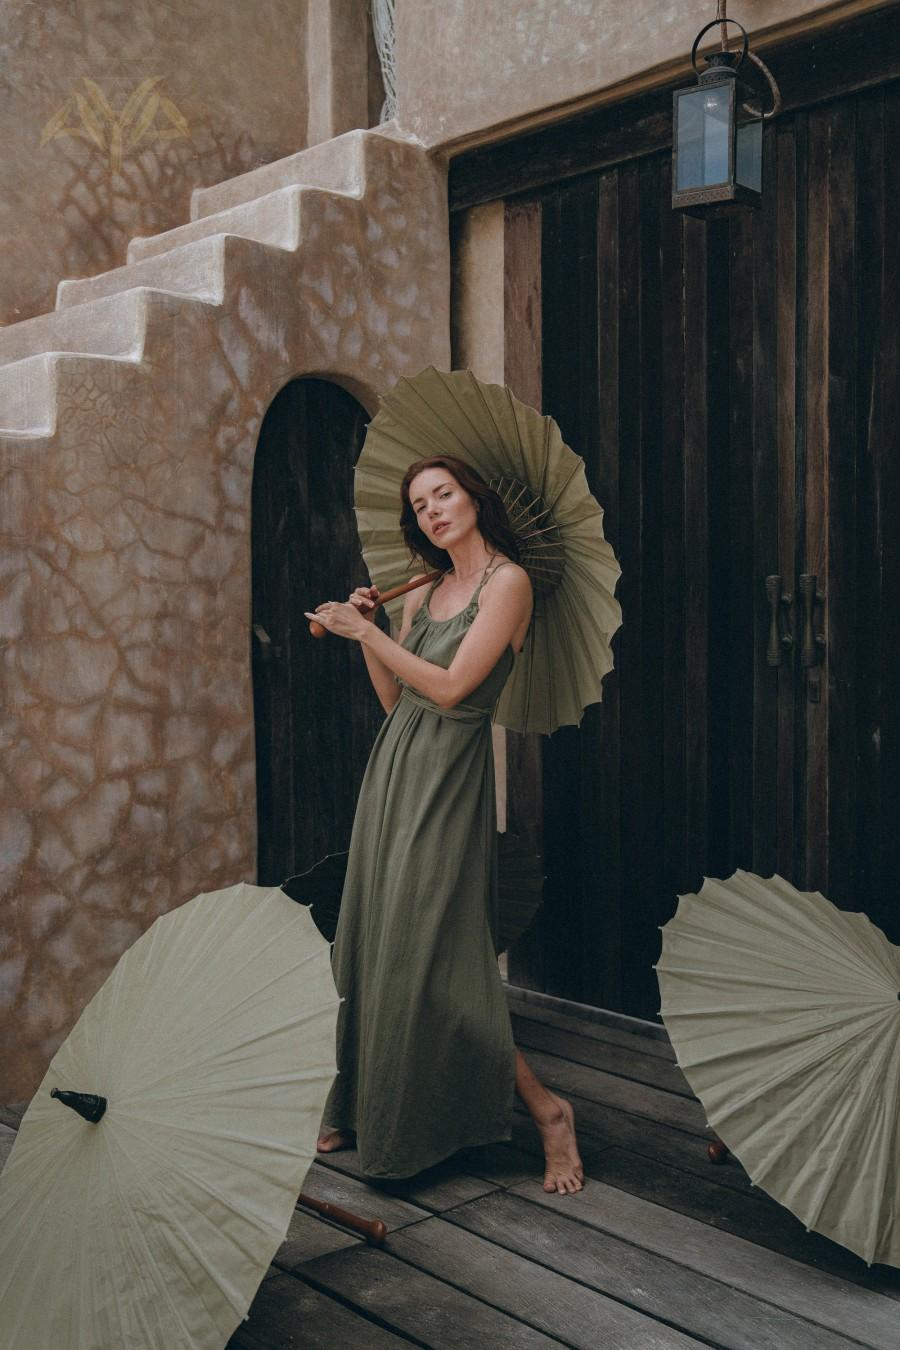 Hochzeit - New! Sage Green Bridesmaid Dress • Boho Dress for Woman • Long Maxi Bohemian Dress • Green Organic Dress • Bohemian Dress with Open Back